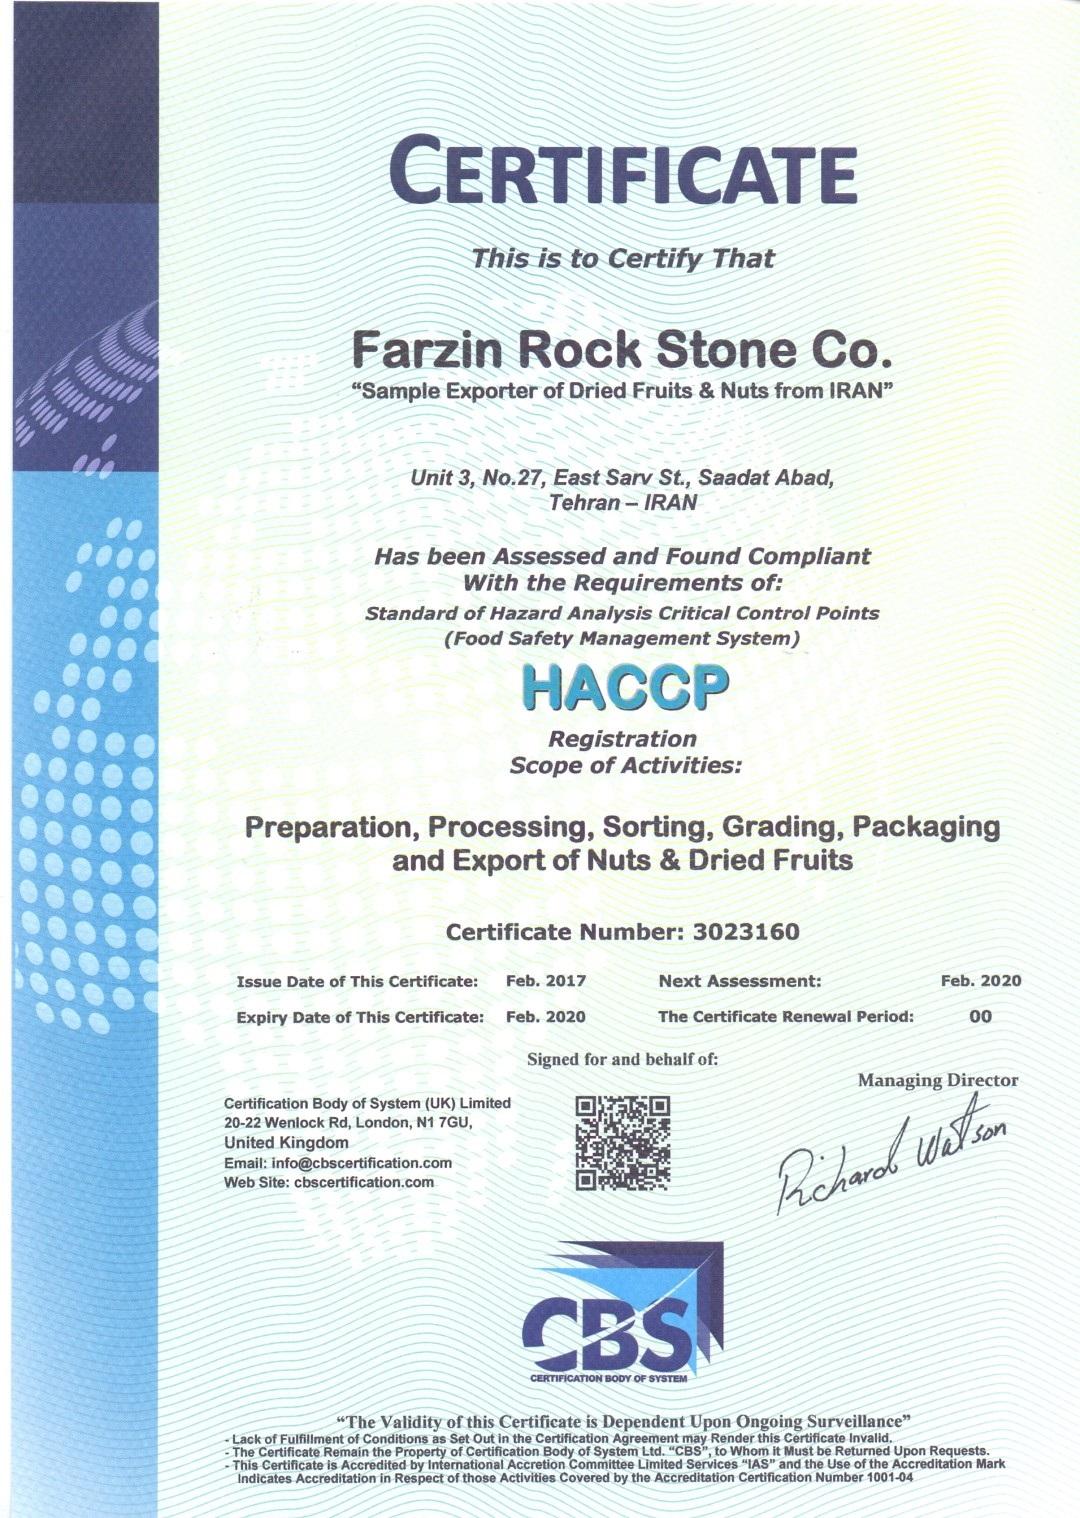 HACCP Certificate